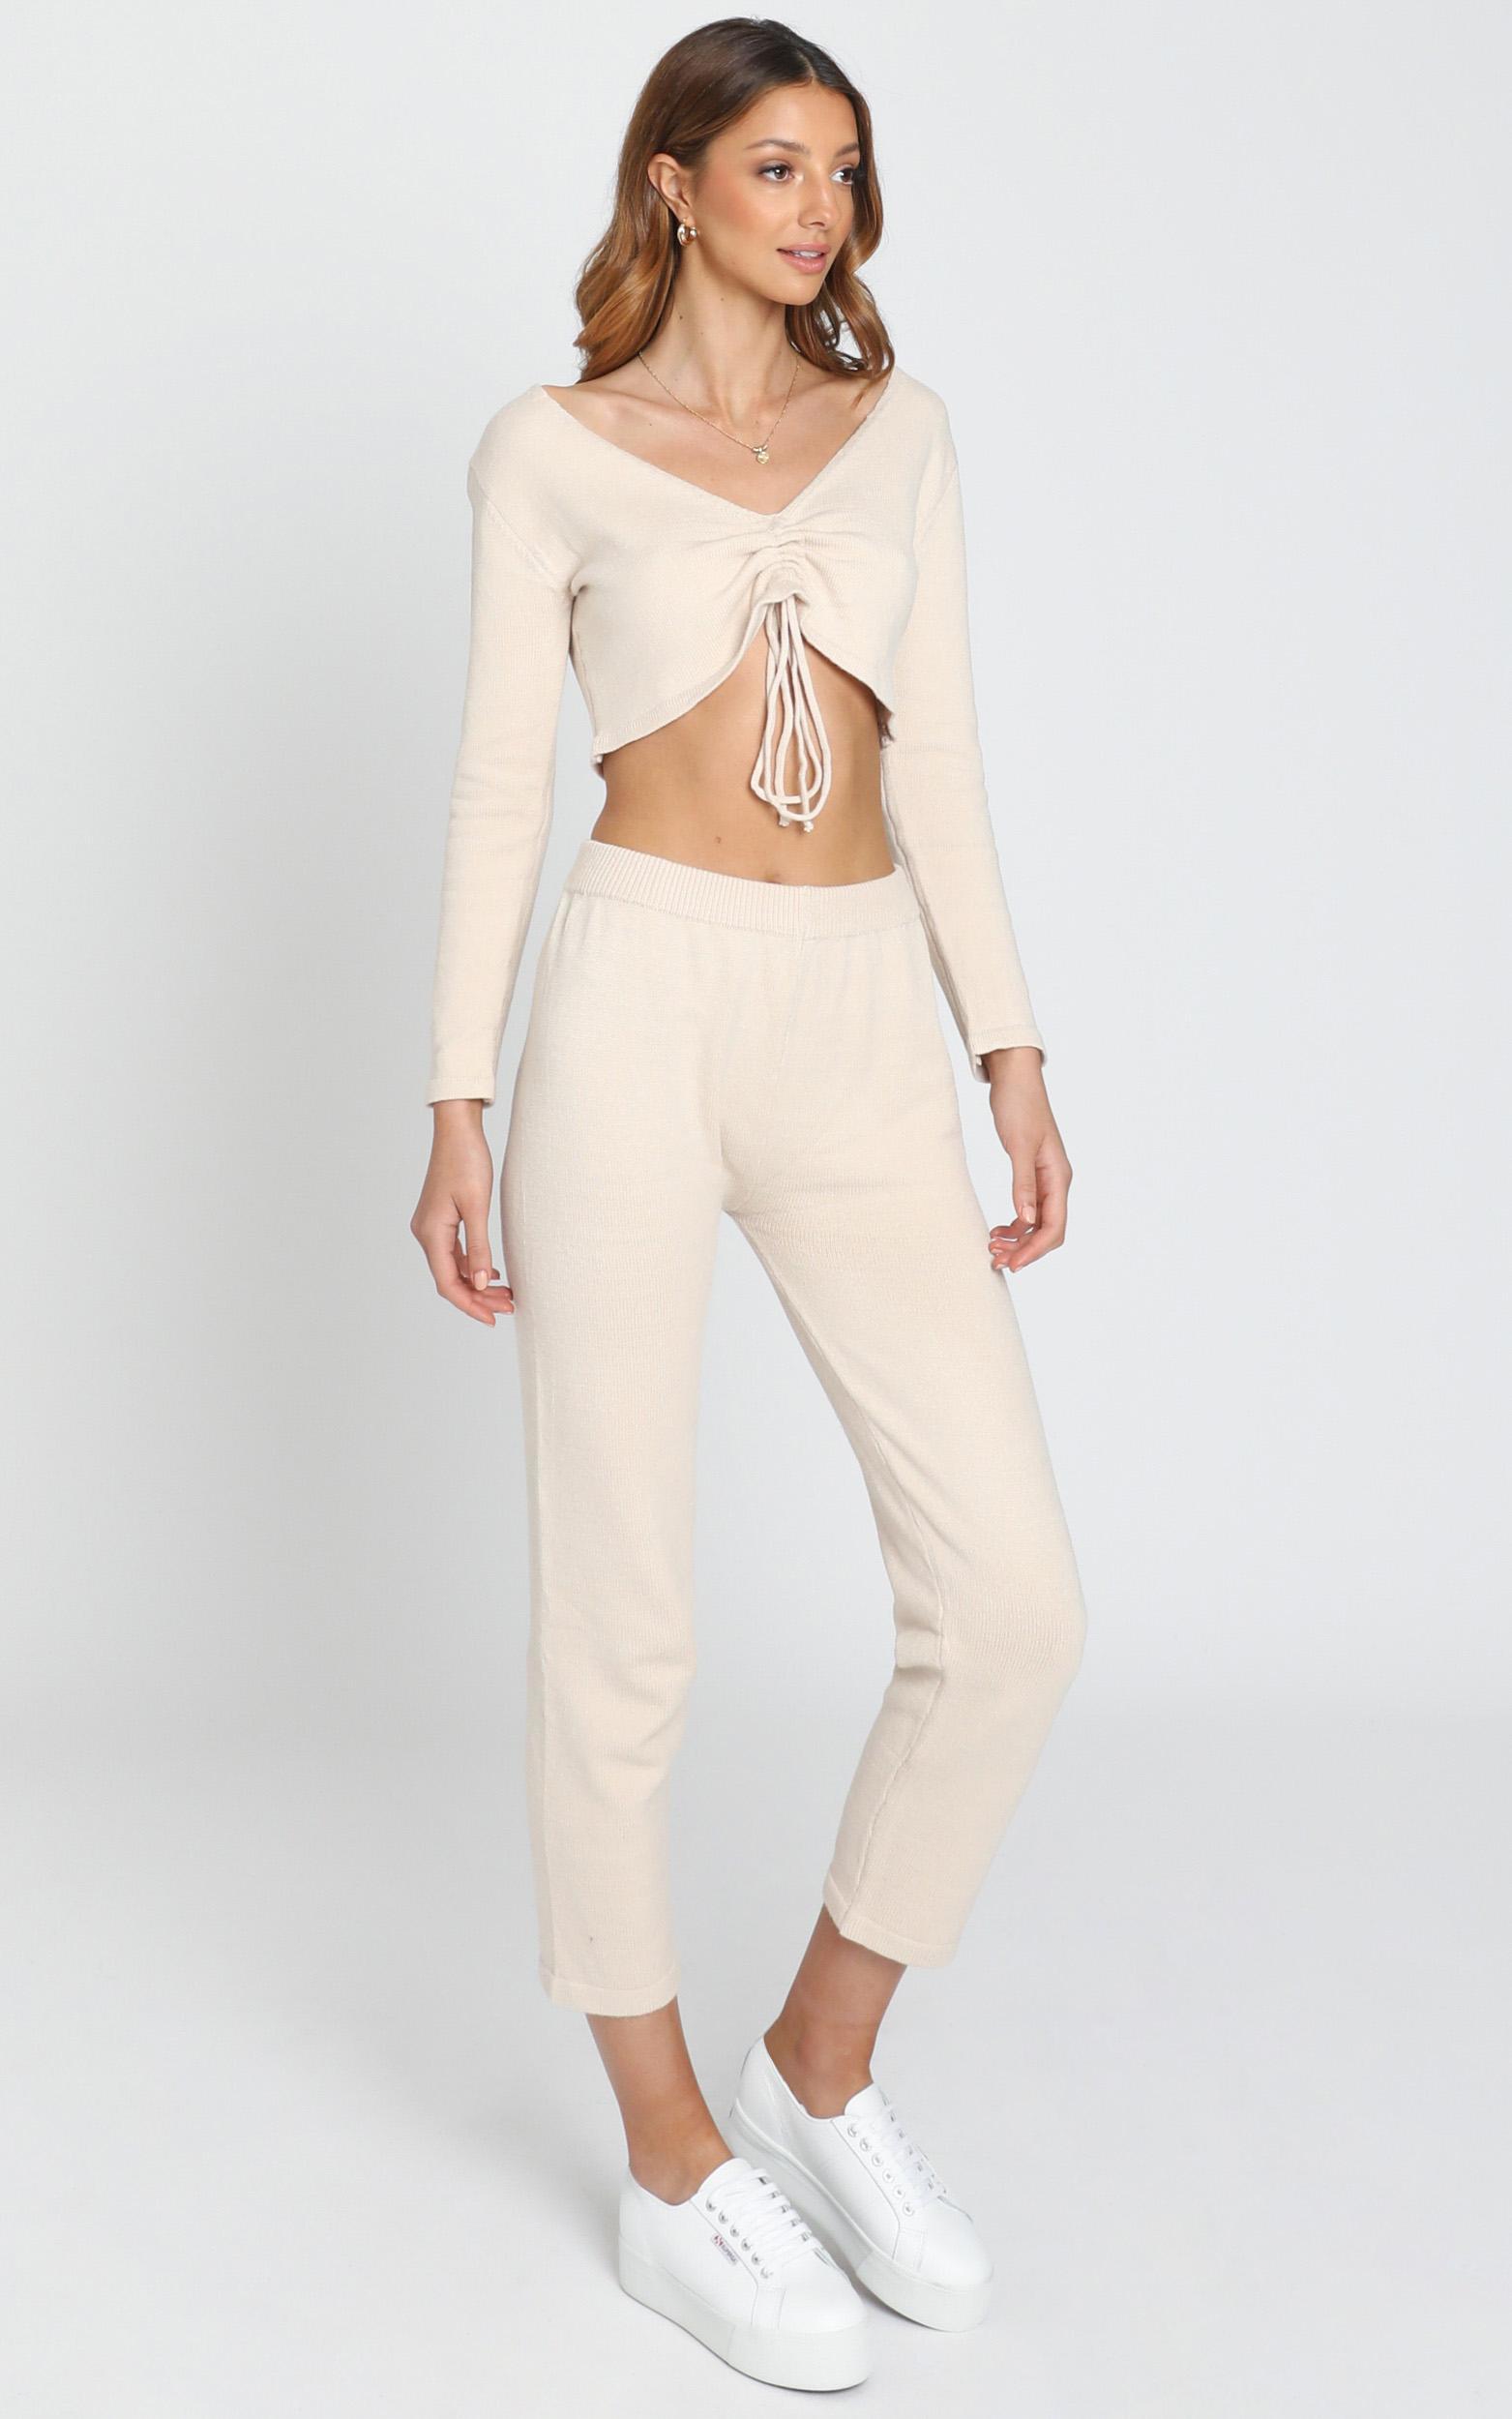 Neutral Hues Knit Pants in  Beige - S/M, Beige, hi-res image number null